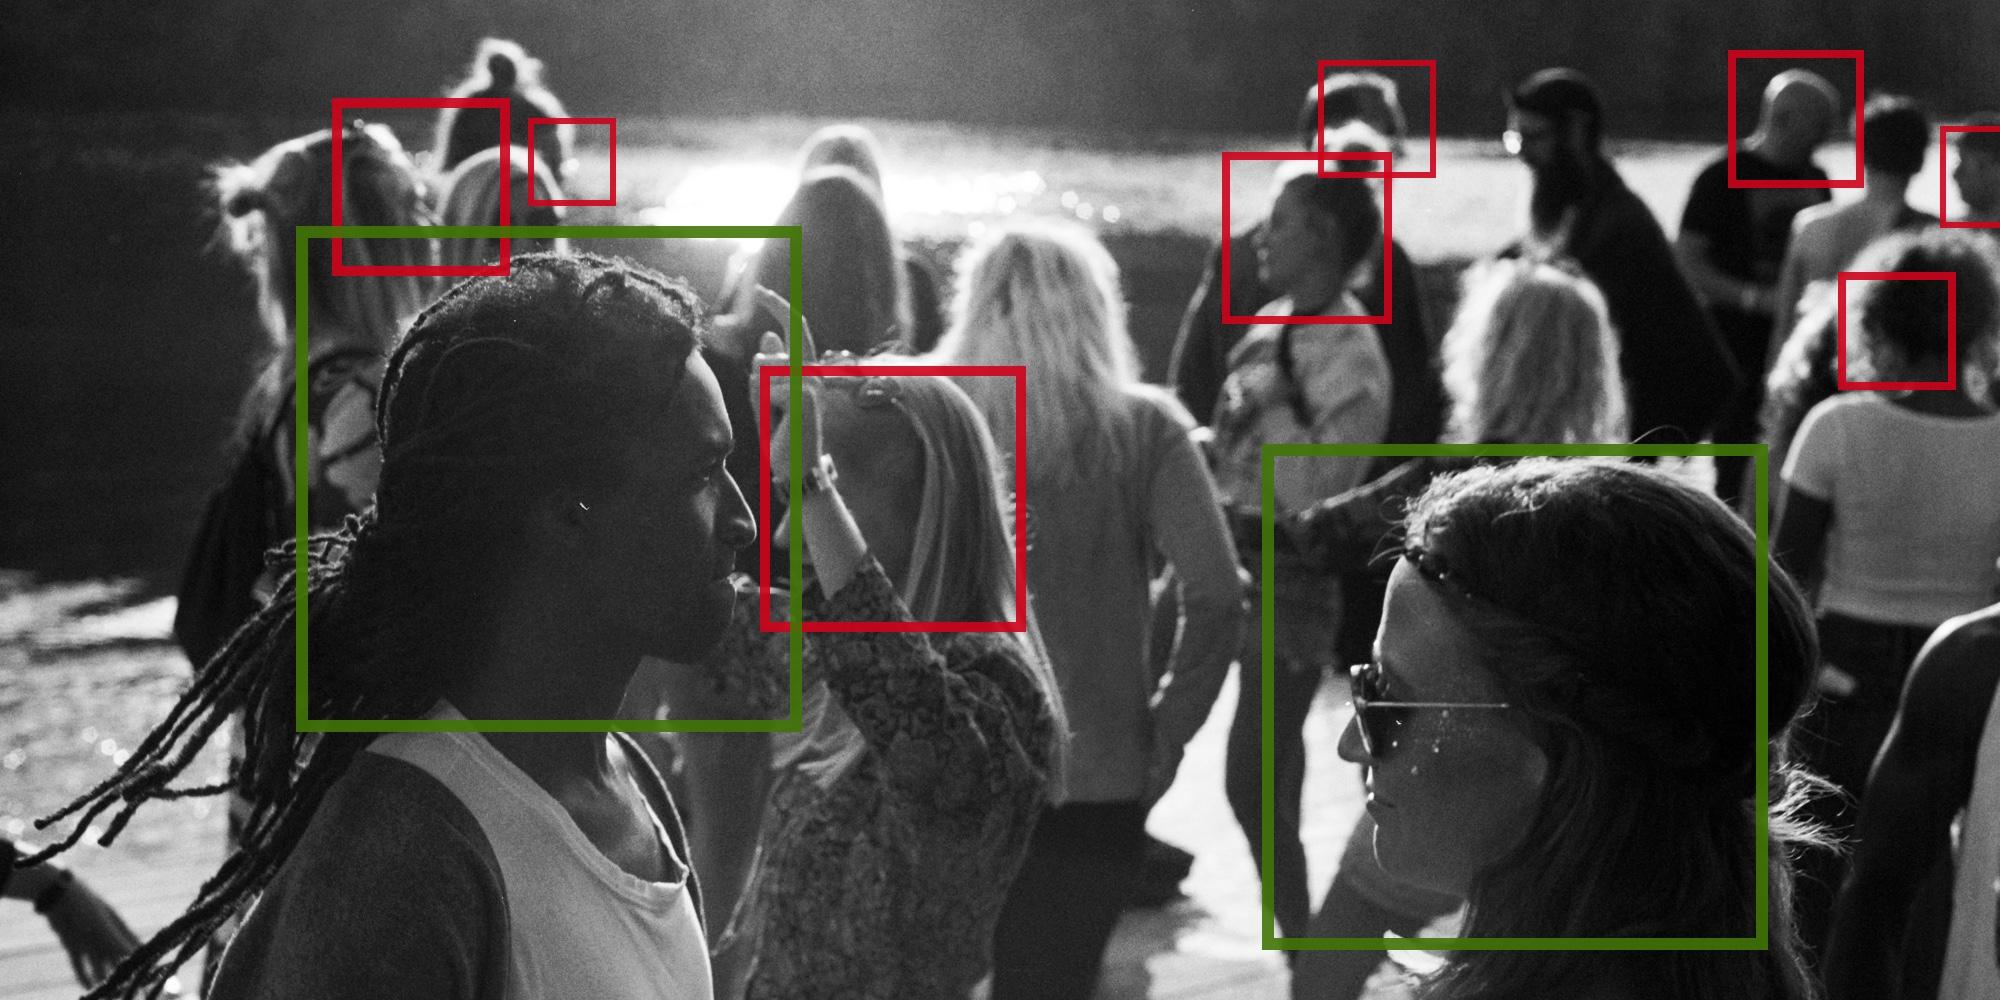 An open conversation about AI ethics